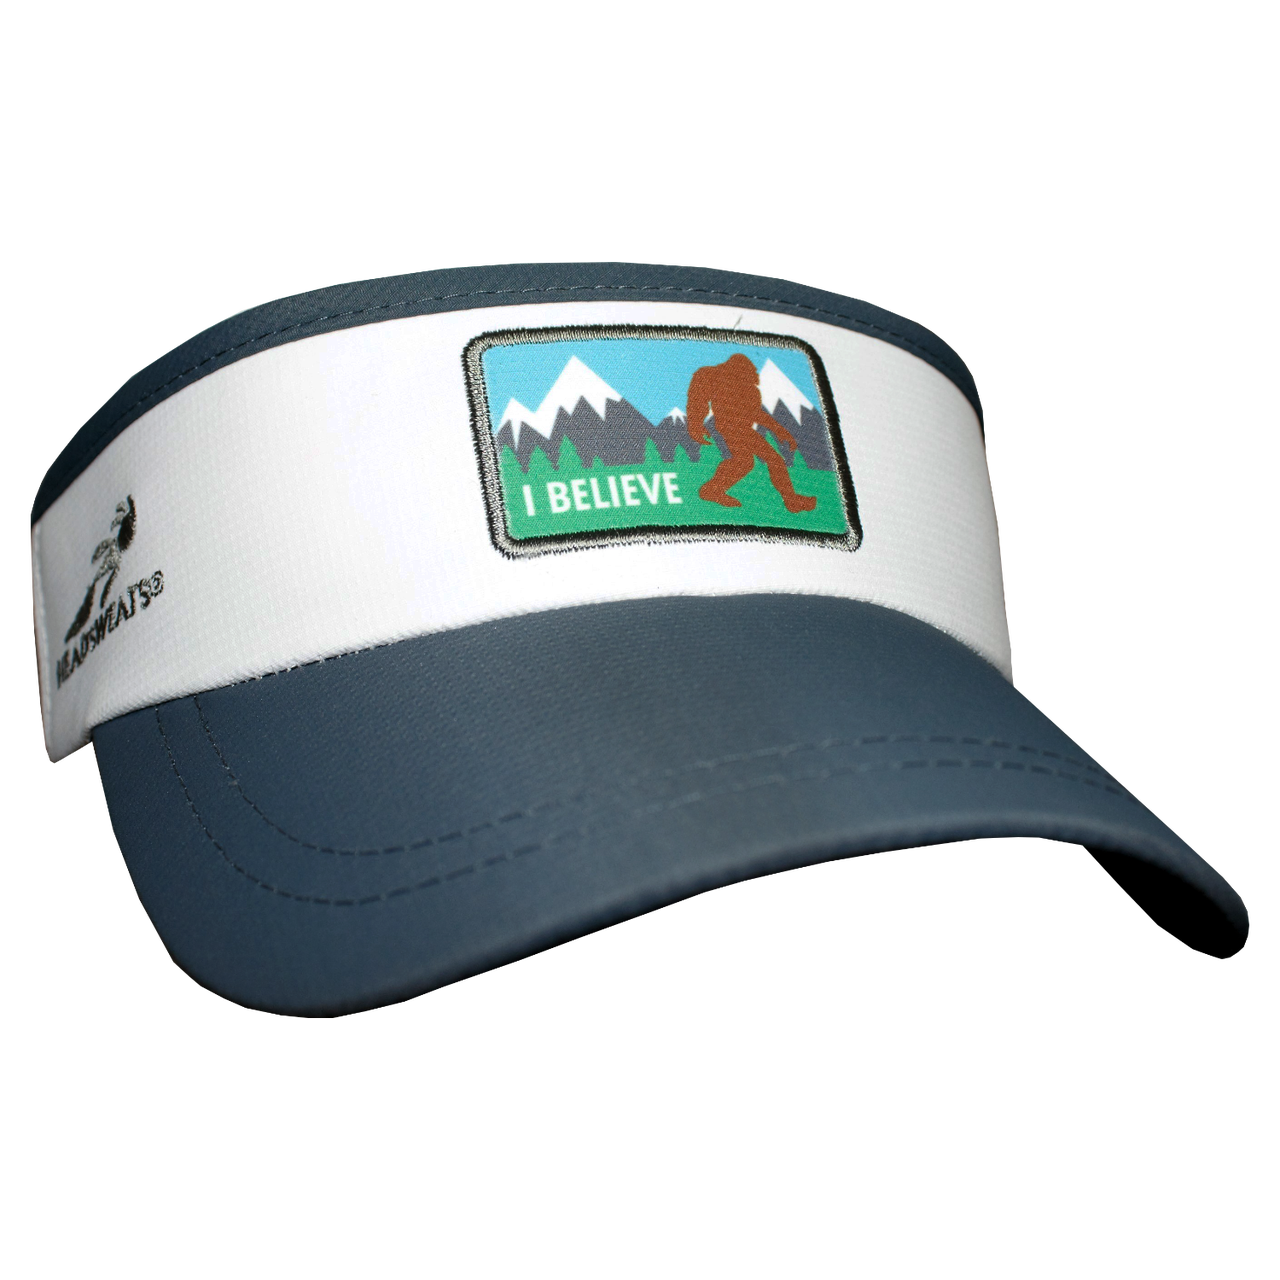 Short girl car sun visor clipart free stock Headsweats - Supervisor - Bigfoot I Believe, $23.00 (http://www ... free stock